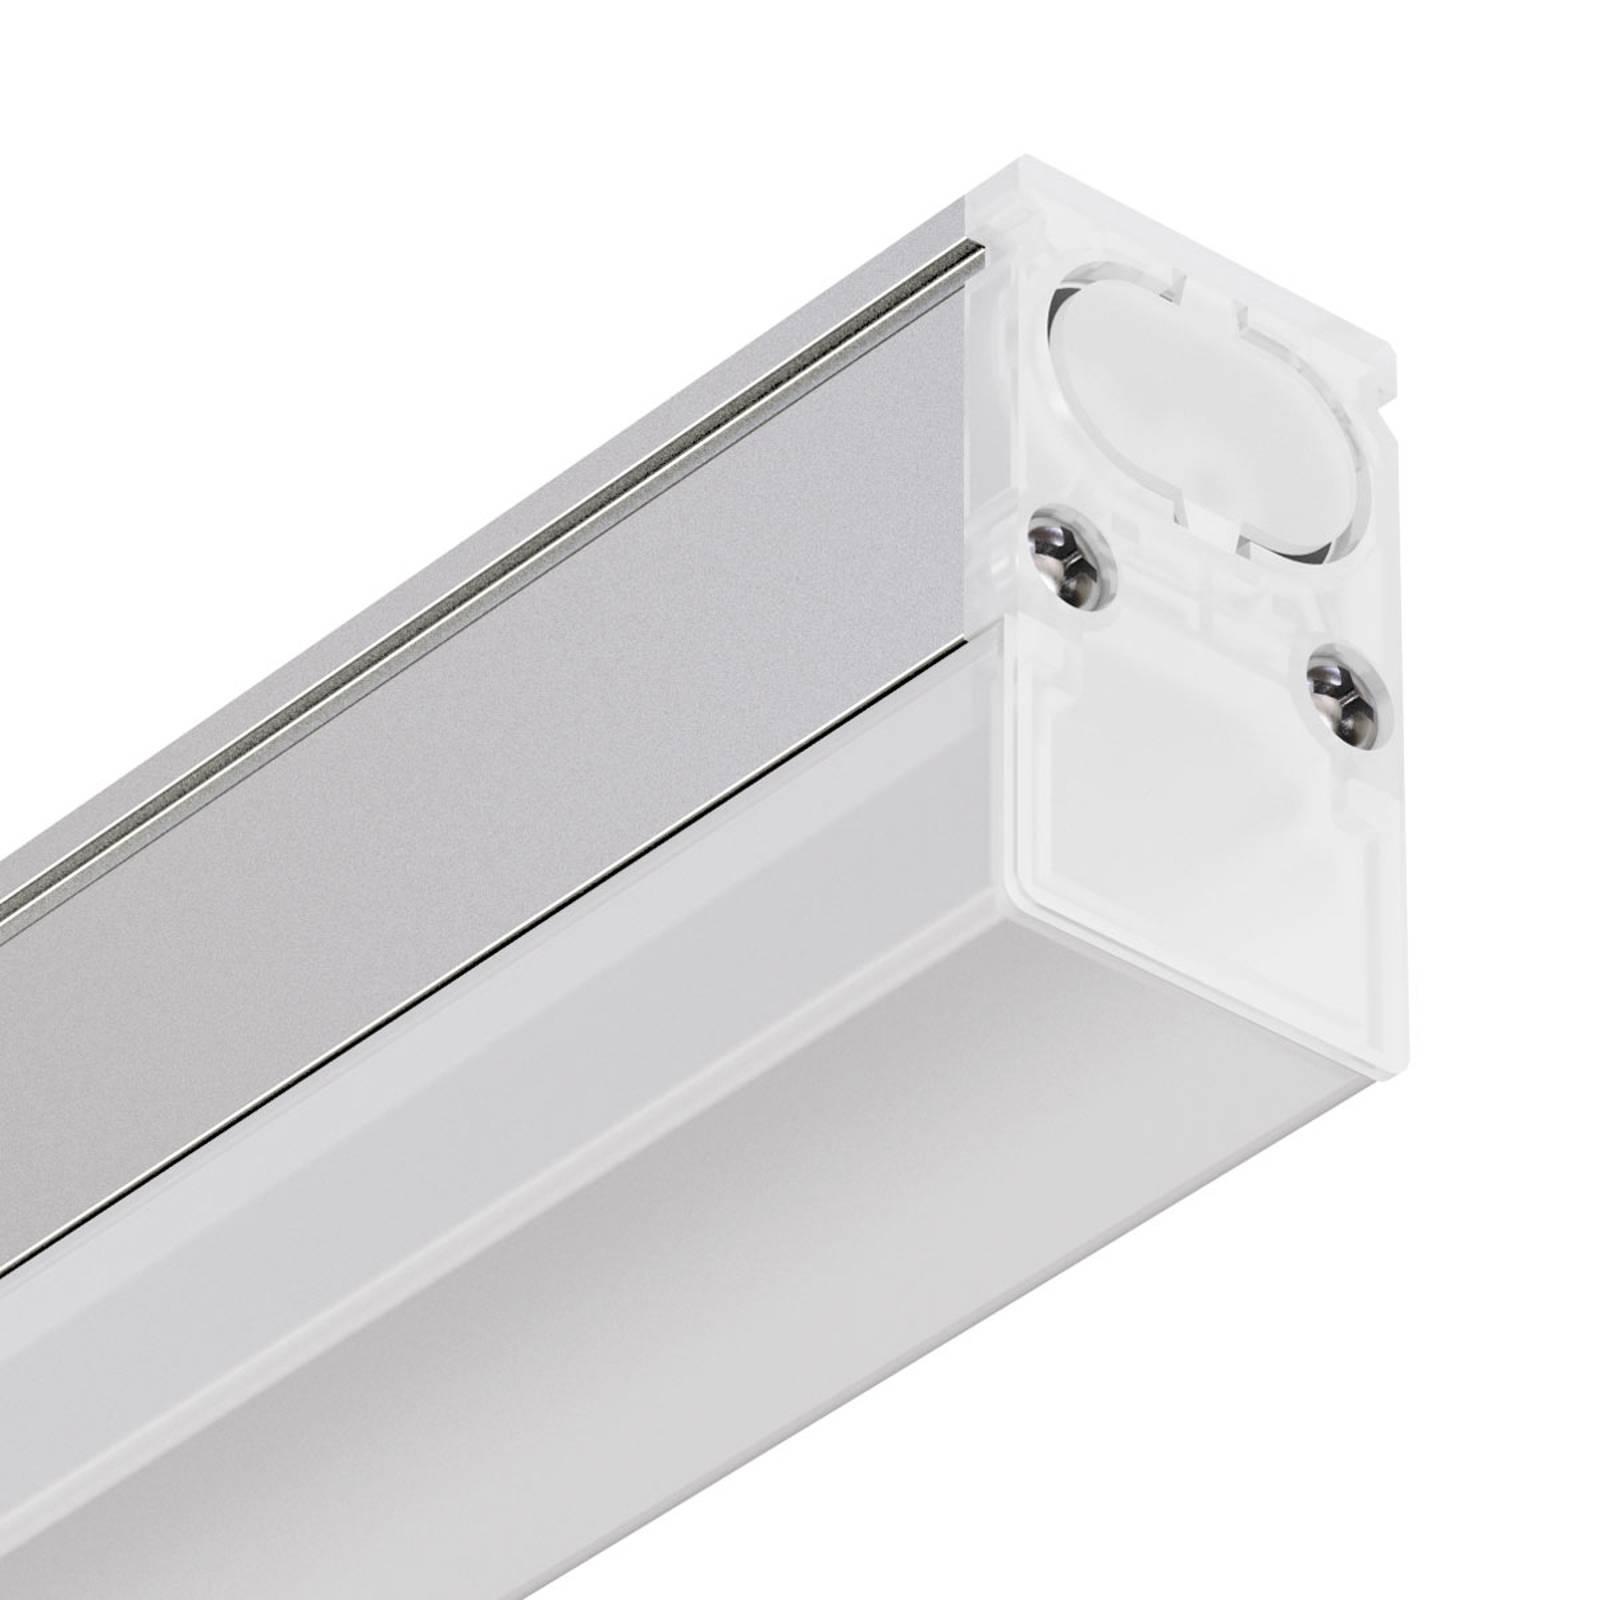 Kapea LED-valolista Lumilux Combi, 10 wattia